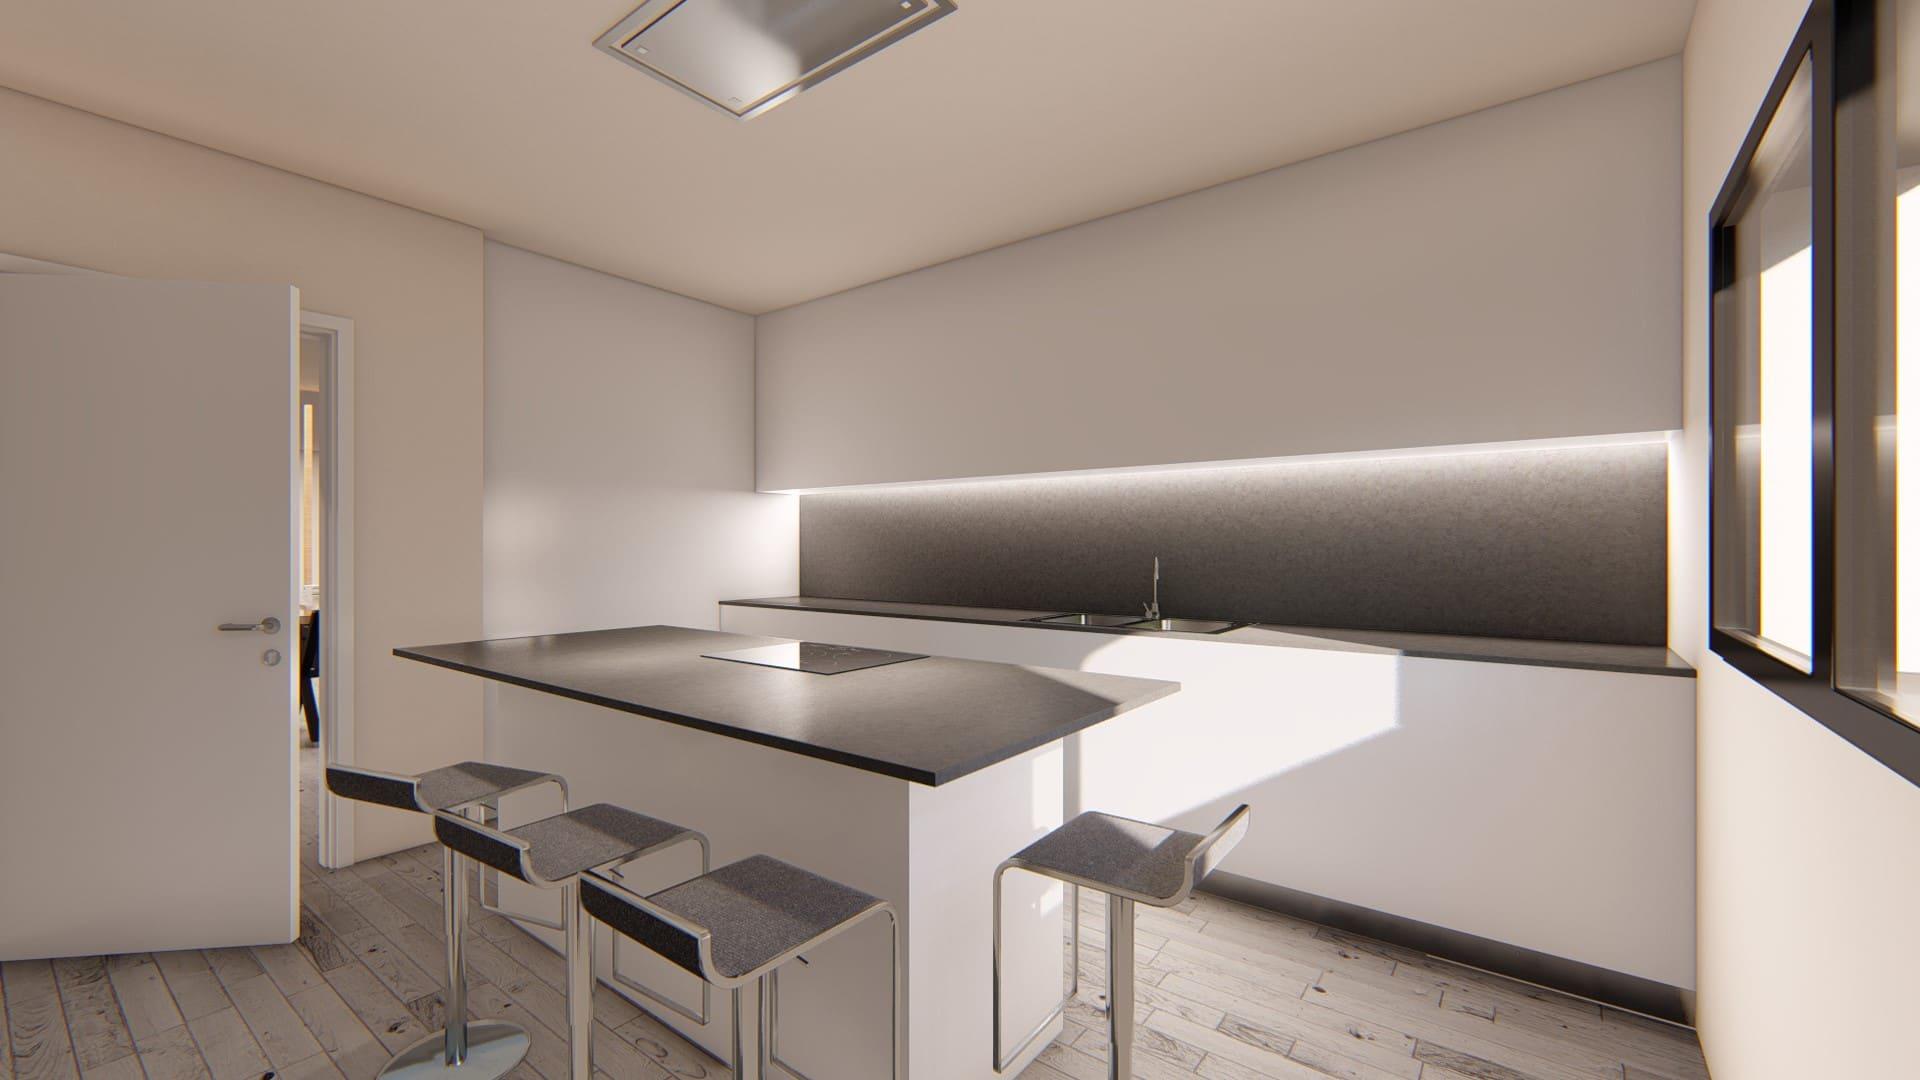 Casa Prefabricada modelo Hospitalet 2